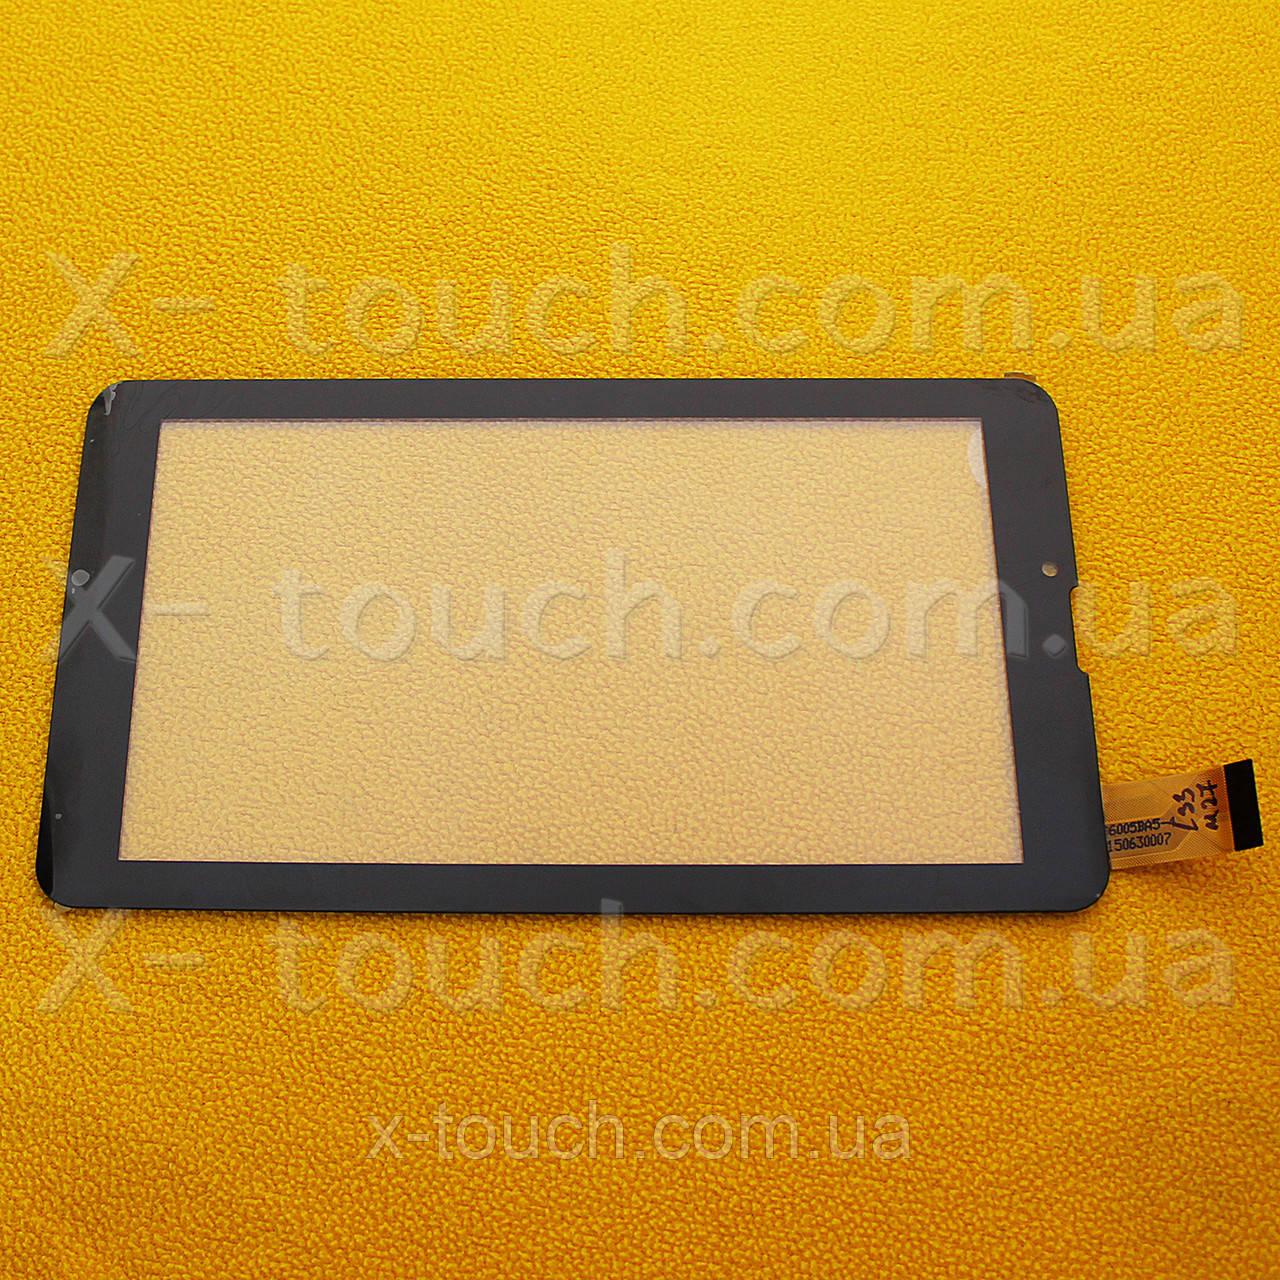 Glofiish X700 cенсор, тачскрин 7,0 дюймов.